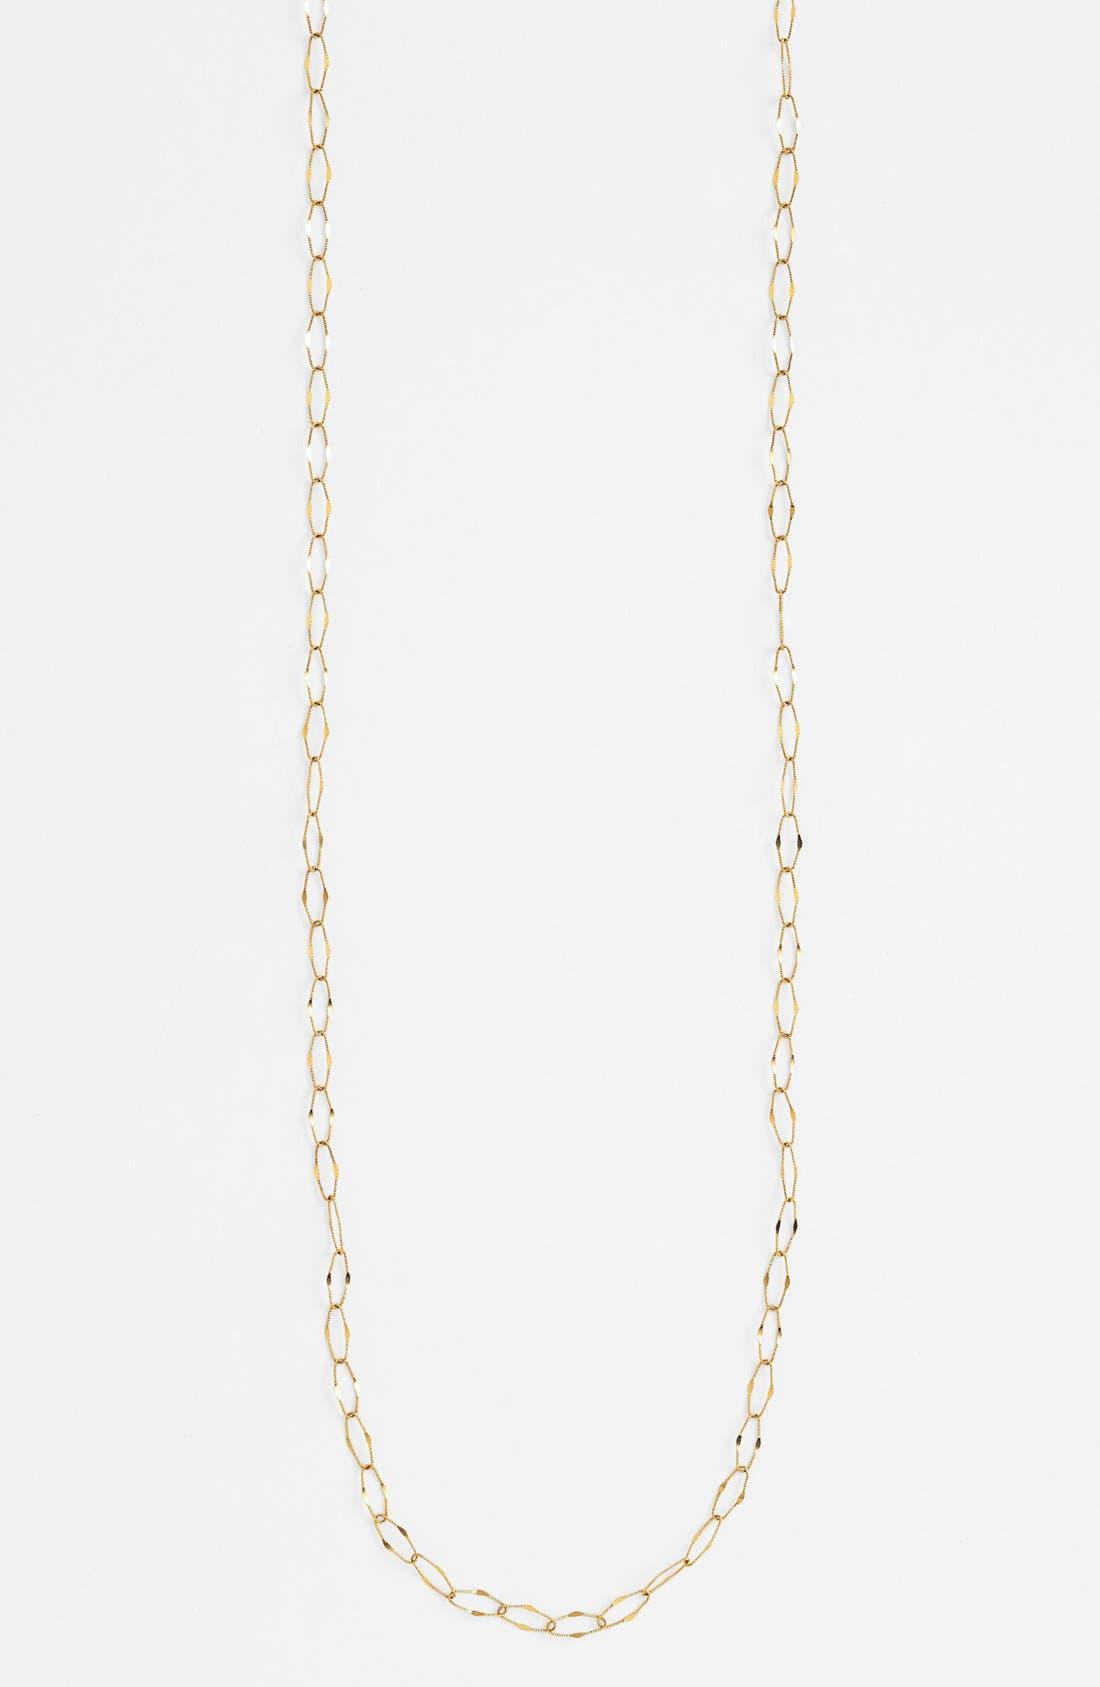 Main Image - Lana Jewelry 'Spellbound - Single Drama' Long Necklace